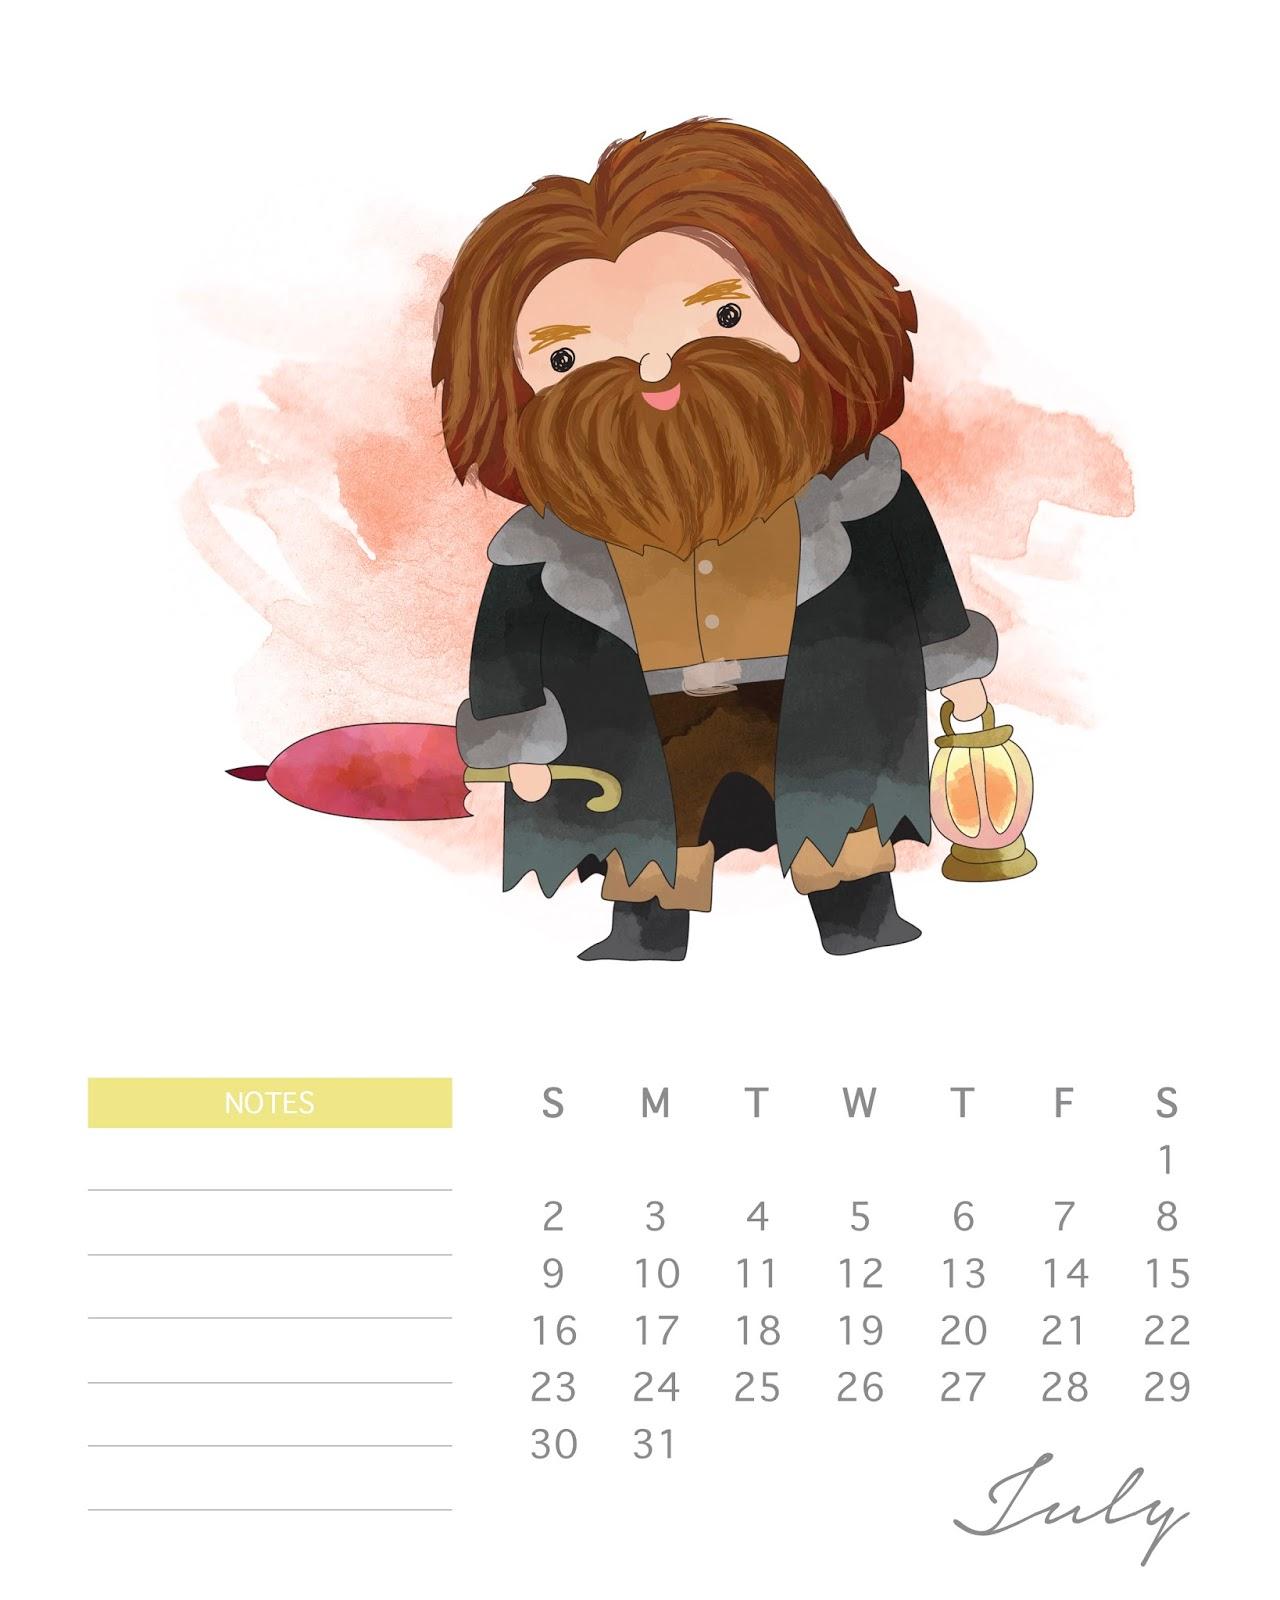 Anime July 2019: Calendario 2017 De Harry Potter Para Imprimir Gratis.